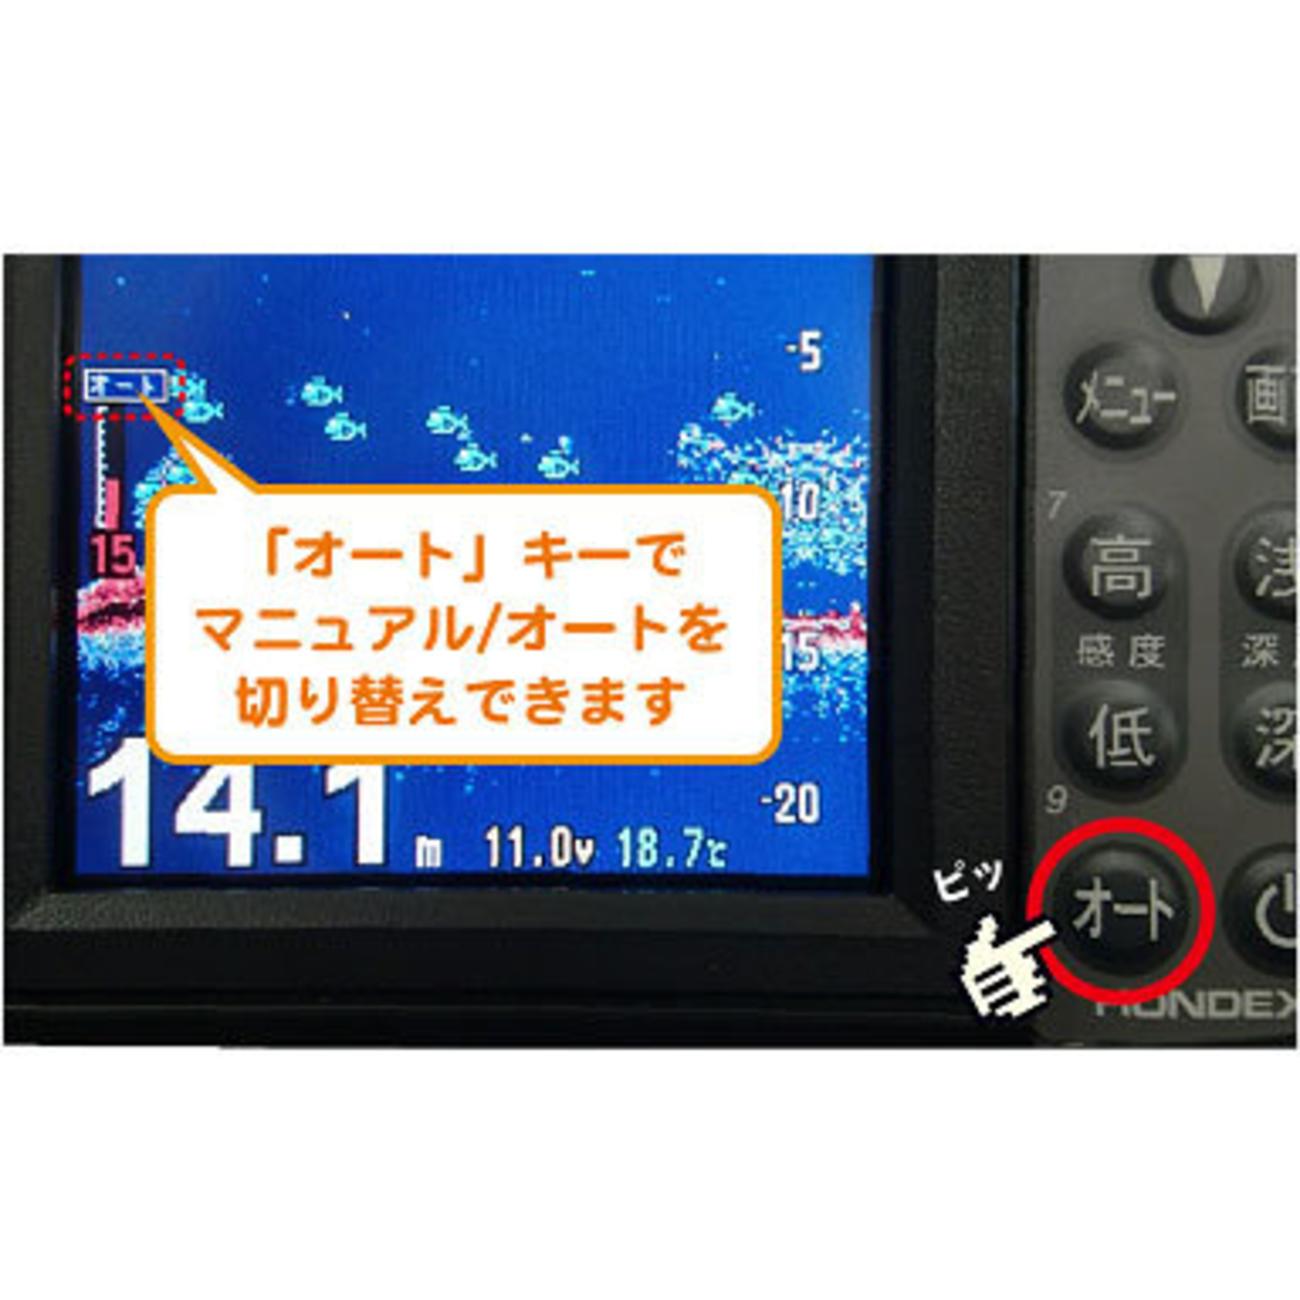 PS-611CNオート